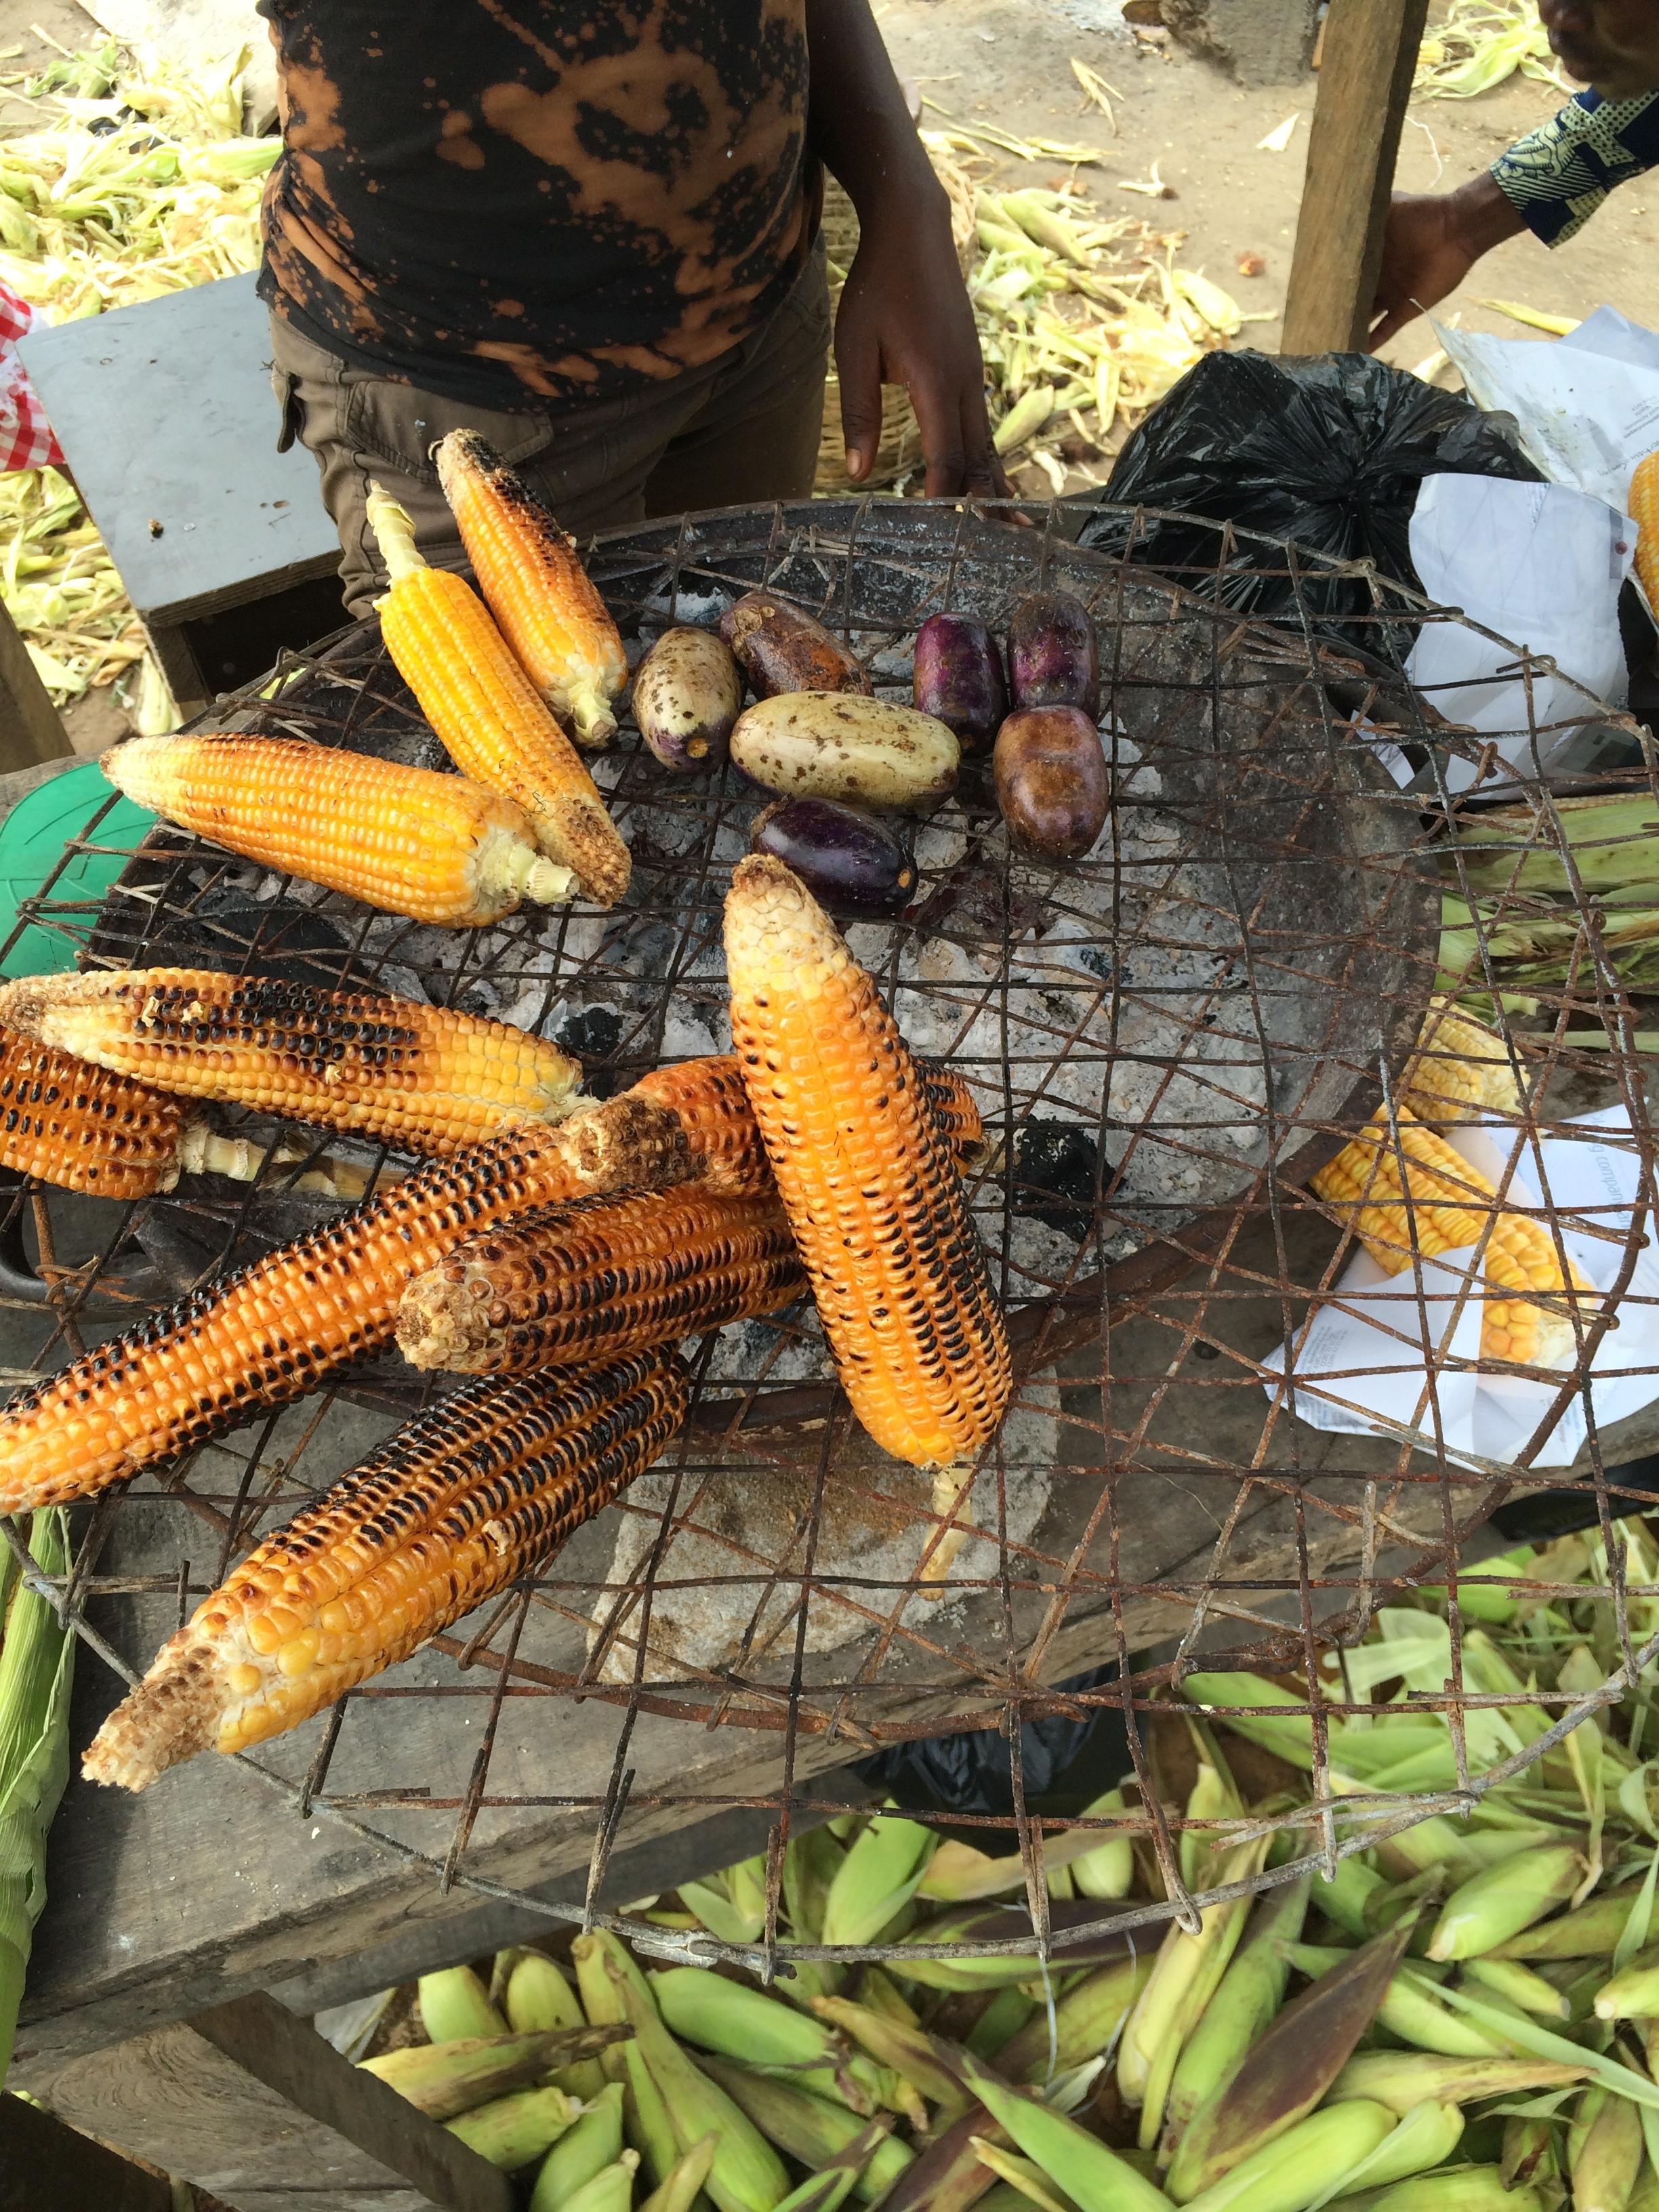 The best street food in Nigeria - Roasted Corn